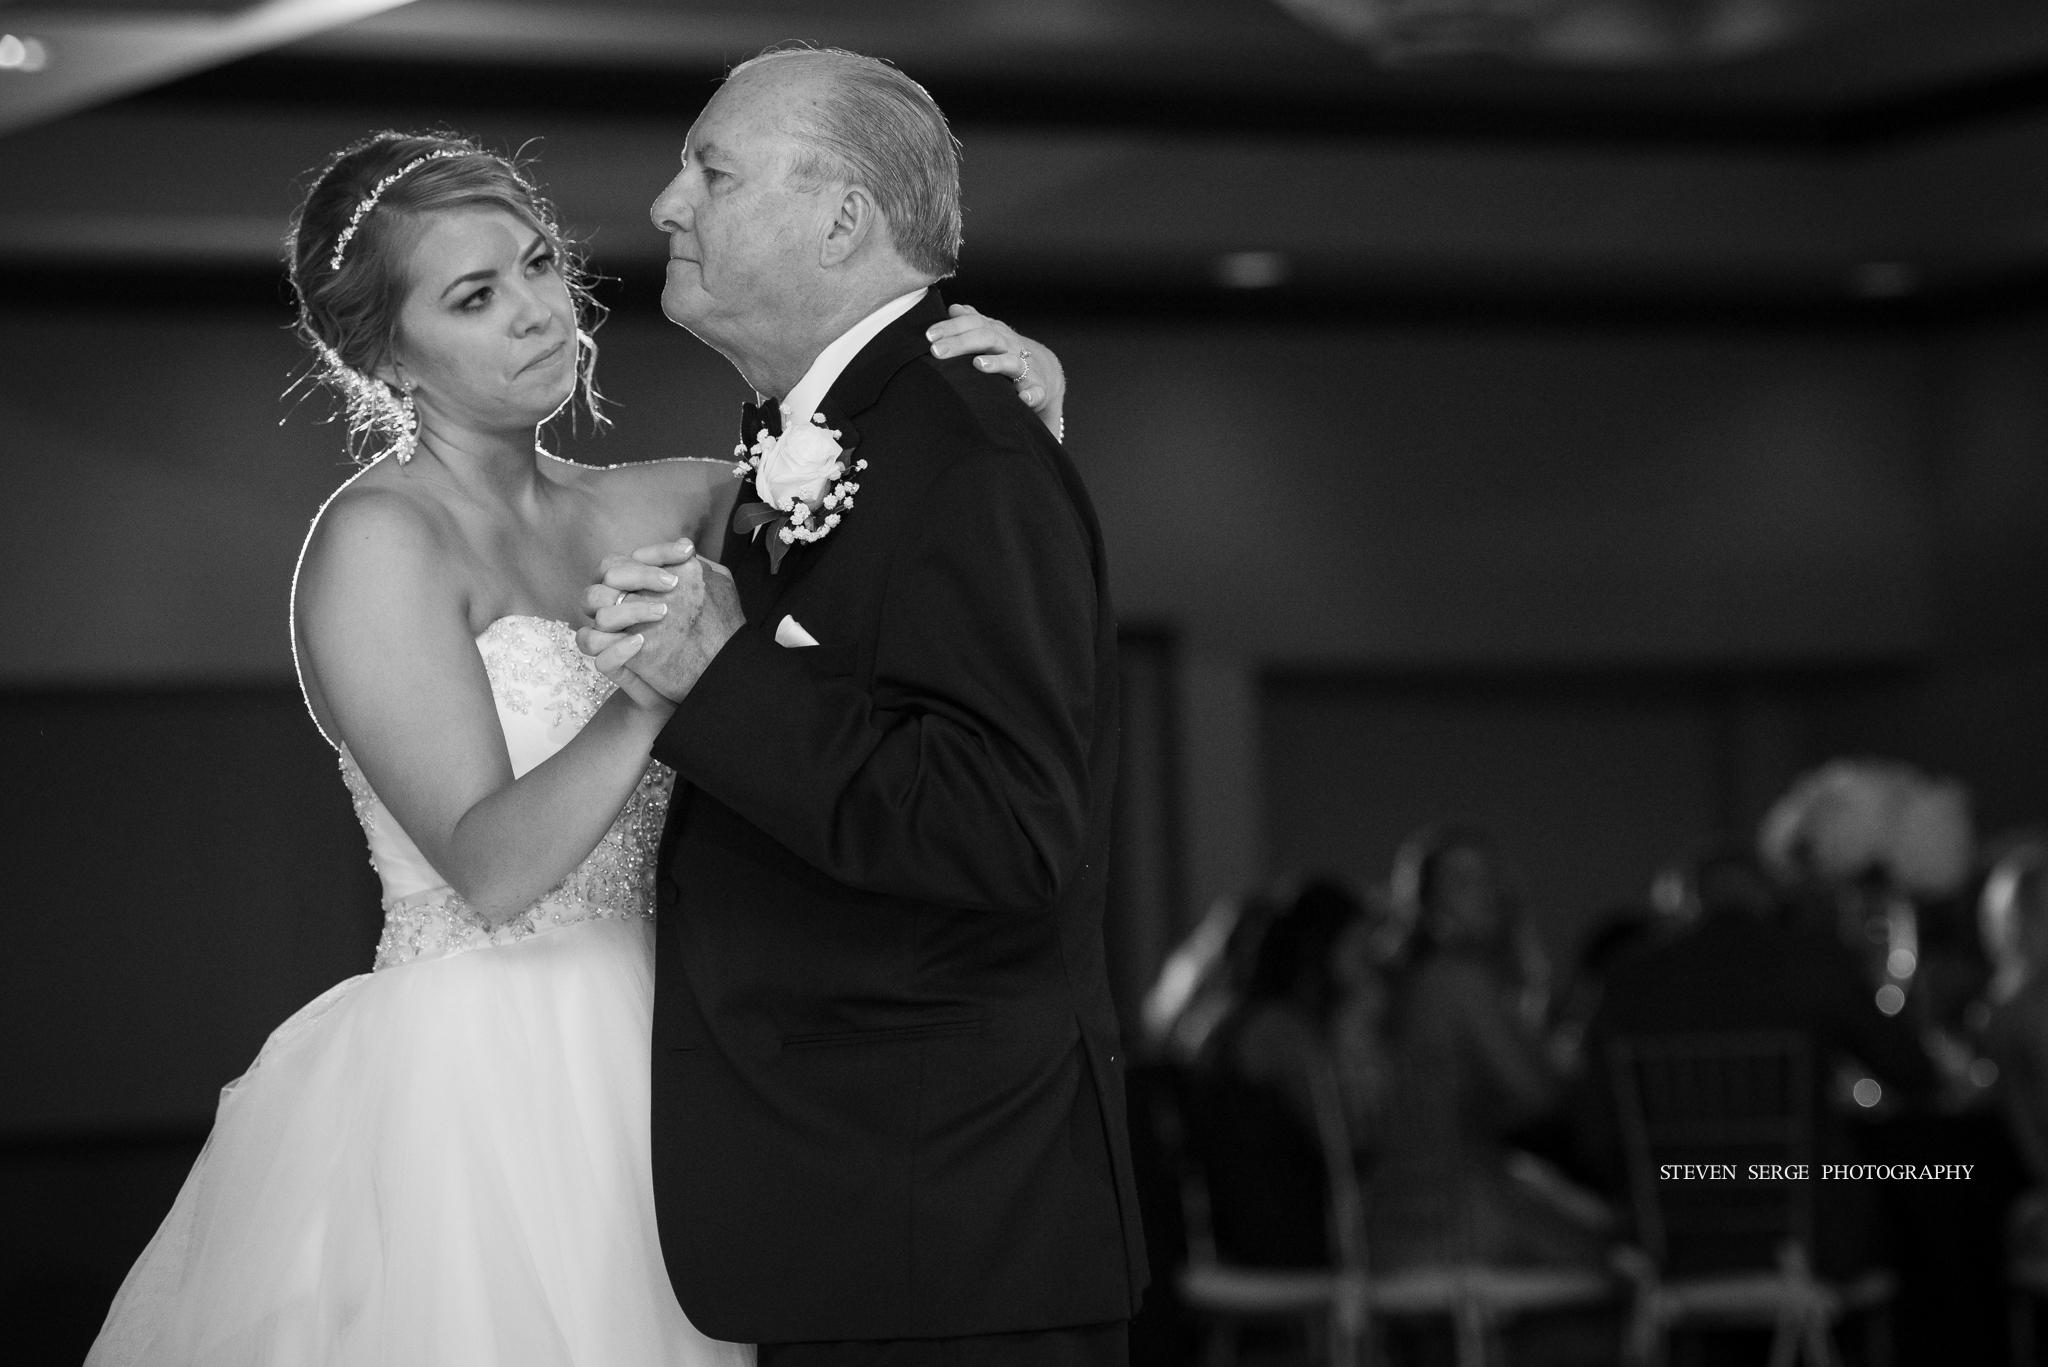 scranton-wedding-photographers-hilton-steven-serge-photography-16.jpg